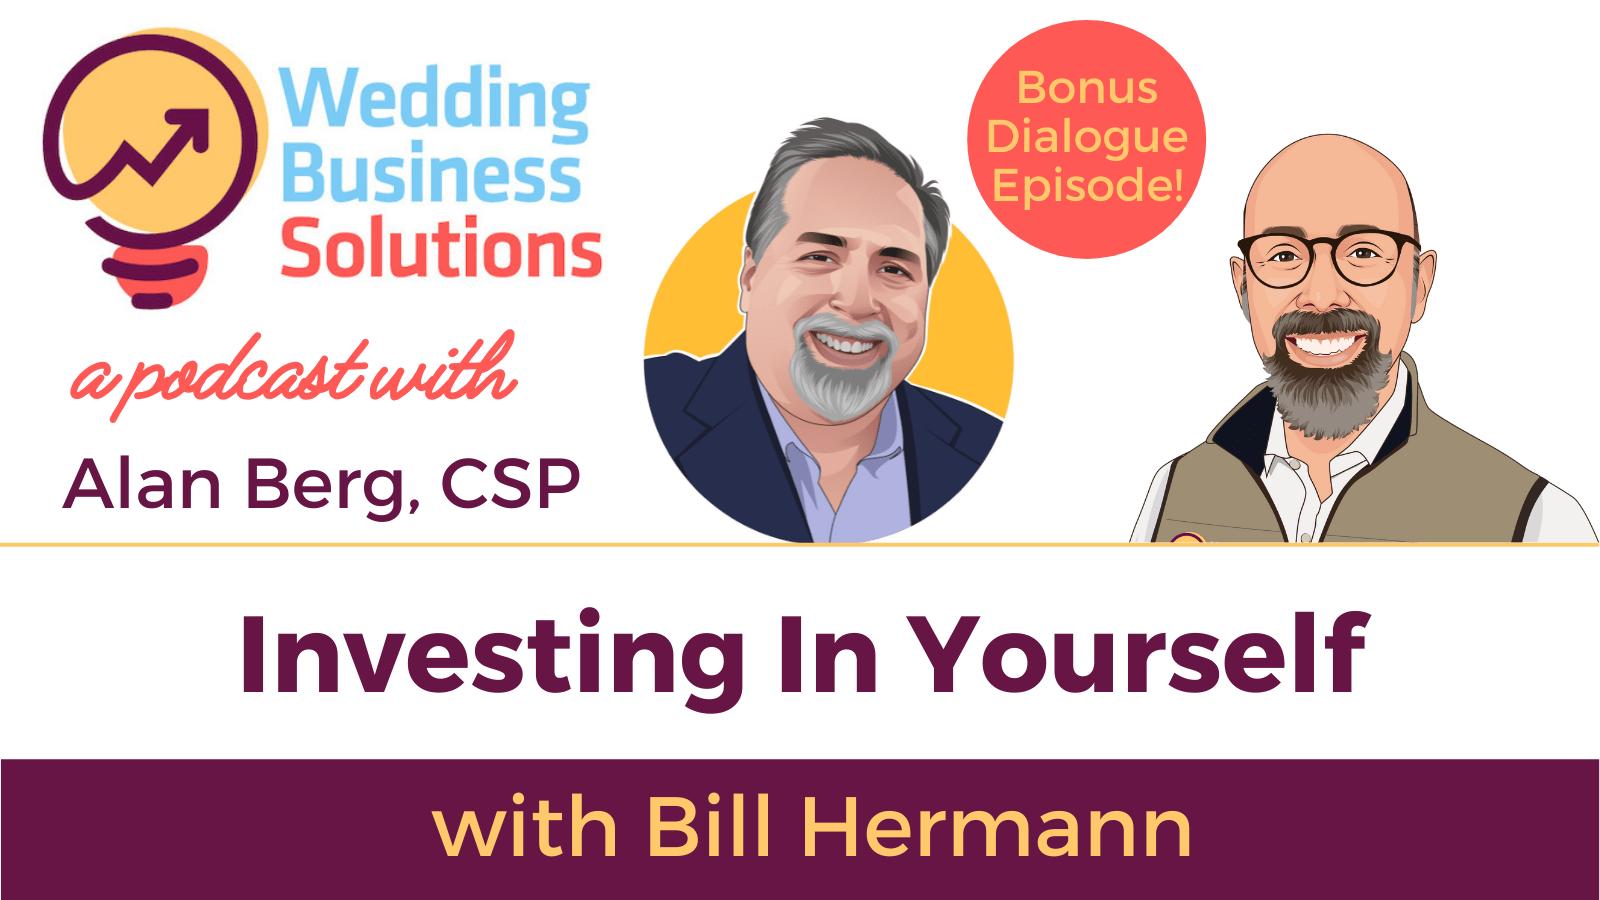 Bill Hermann – Investing in Yourself – Bonus Dialogue Episode